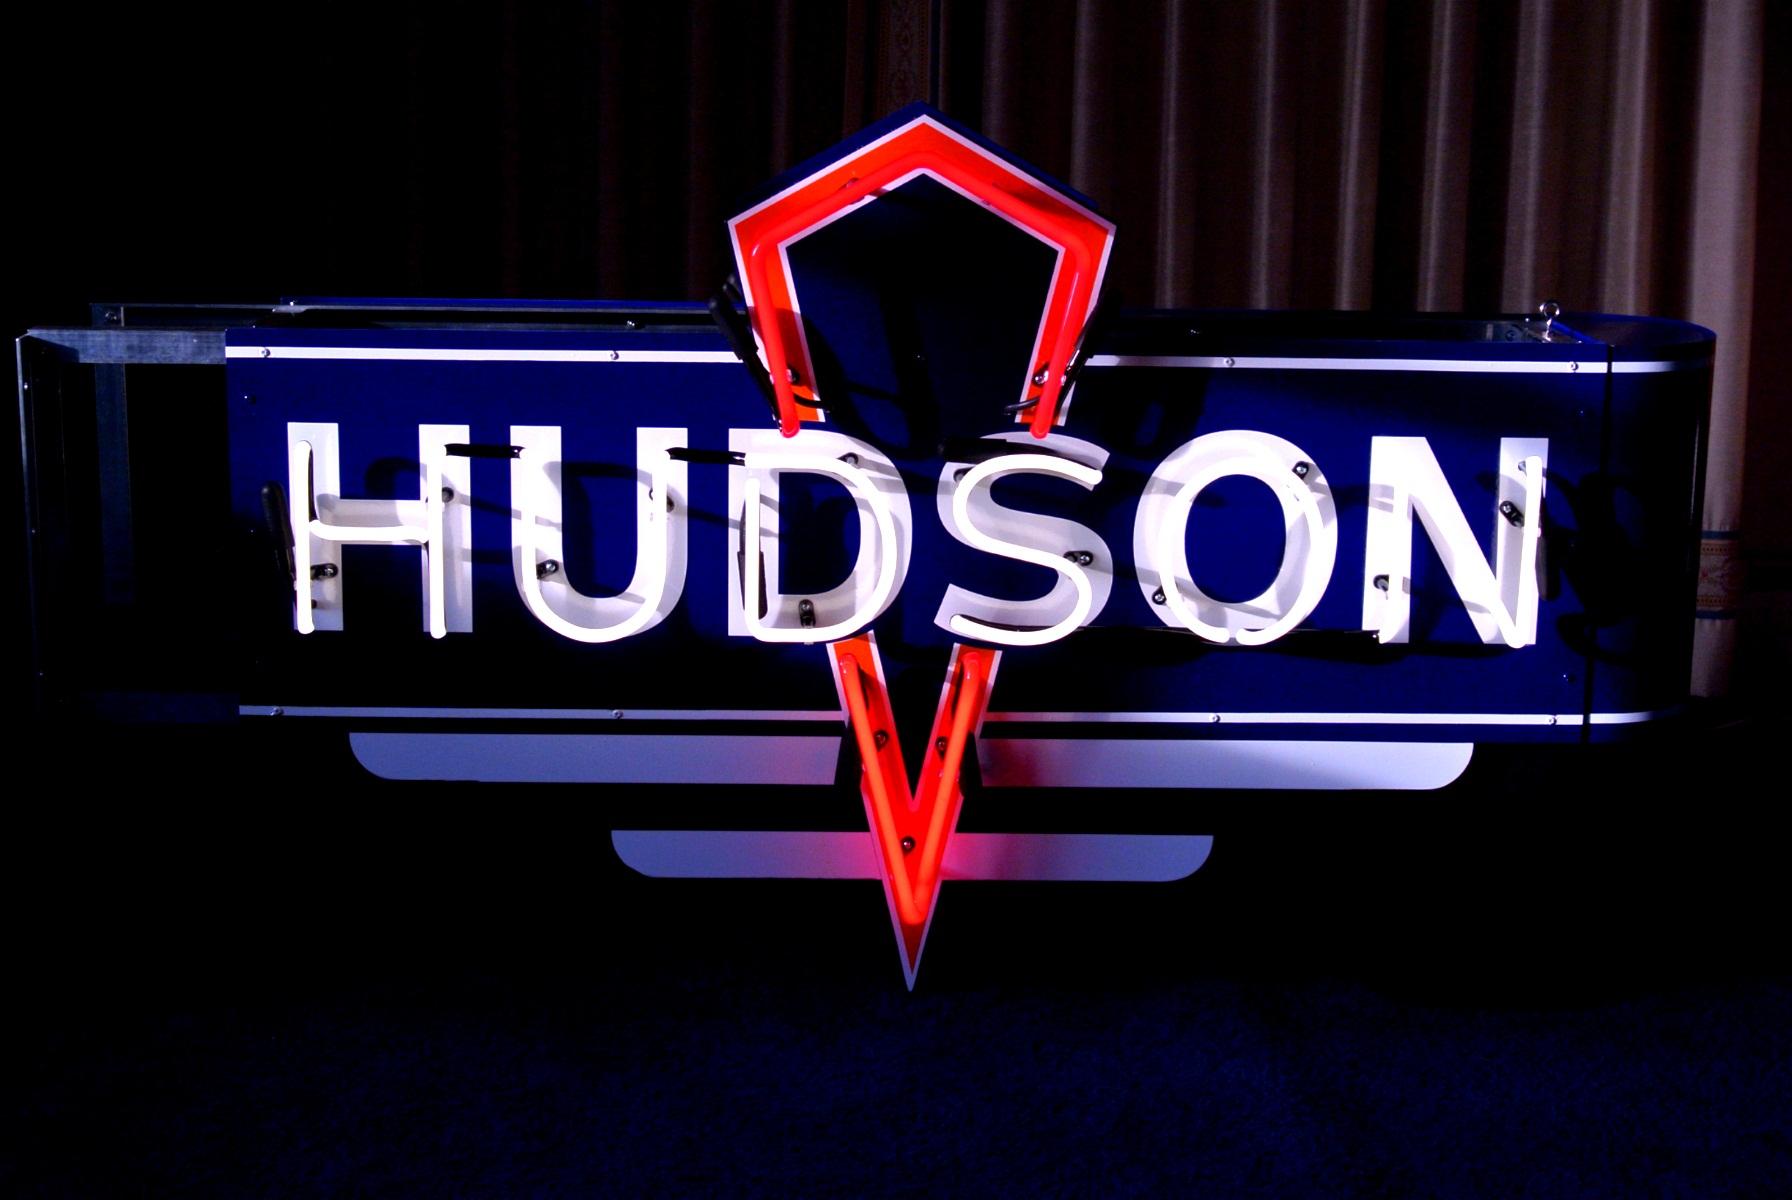 Custom Automotive Neon Signs by John Barton - BartonNeonMagic.com